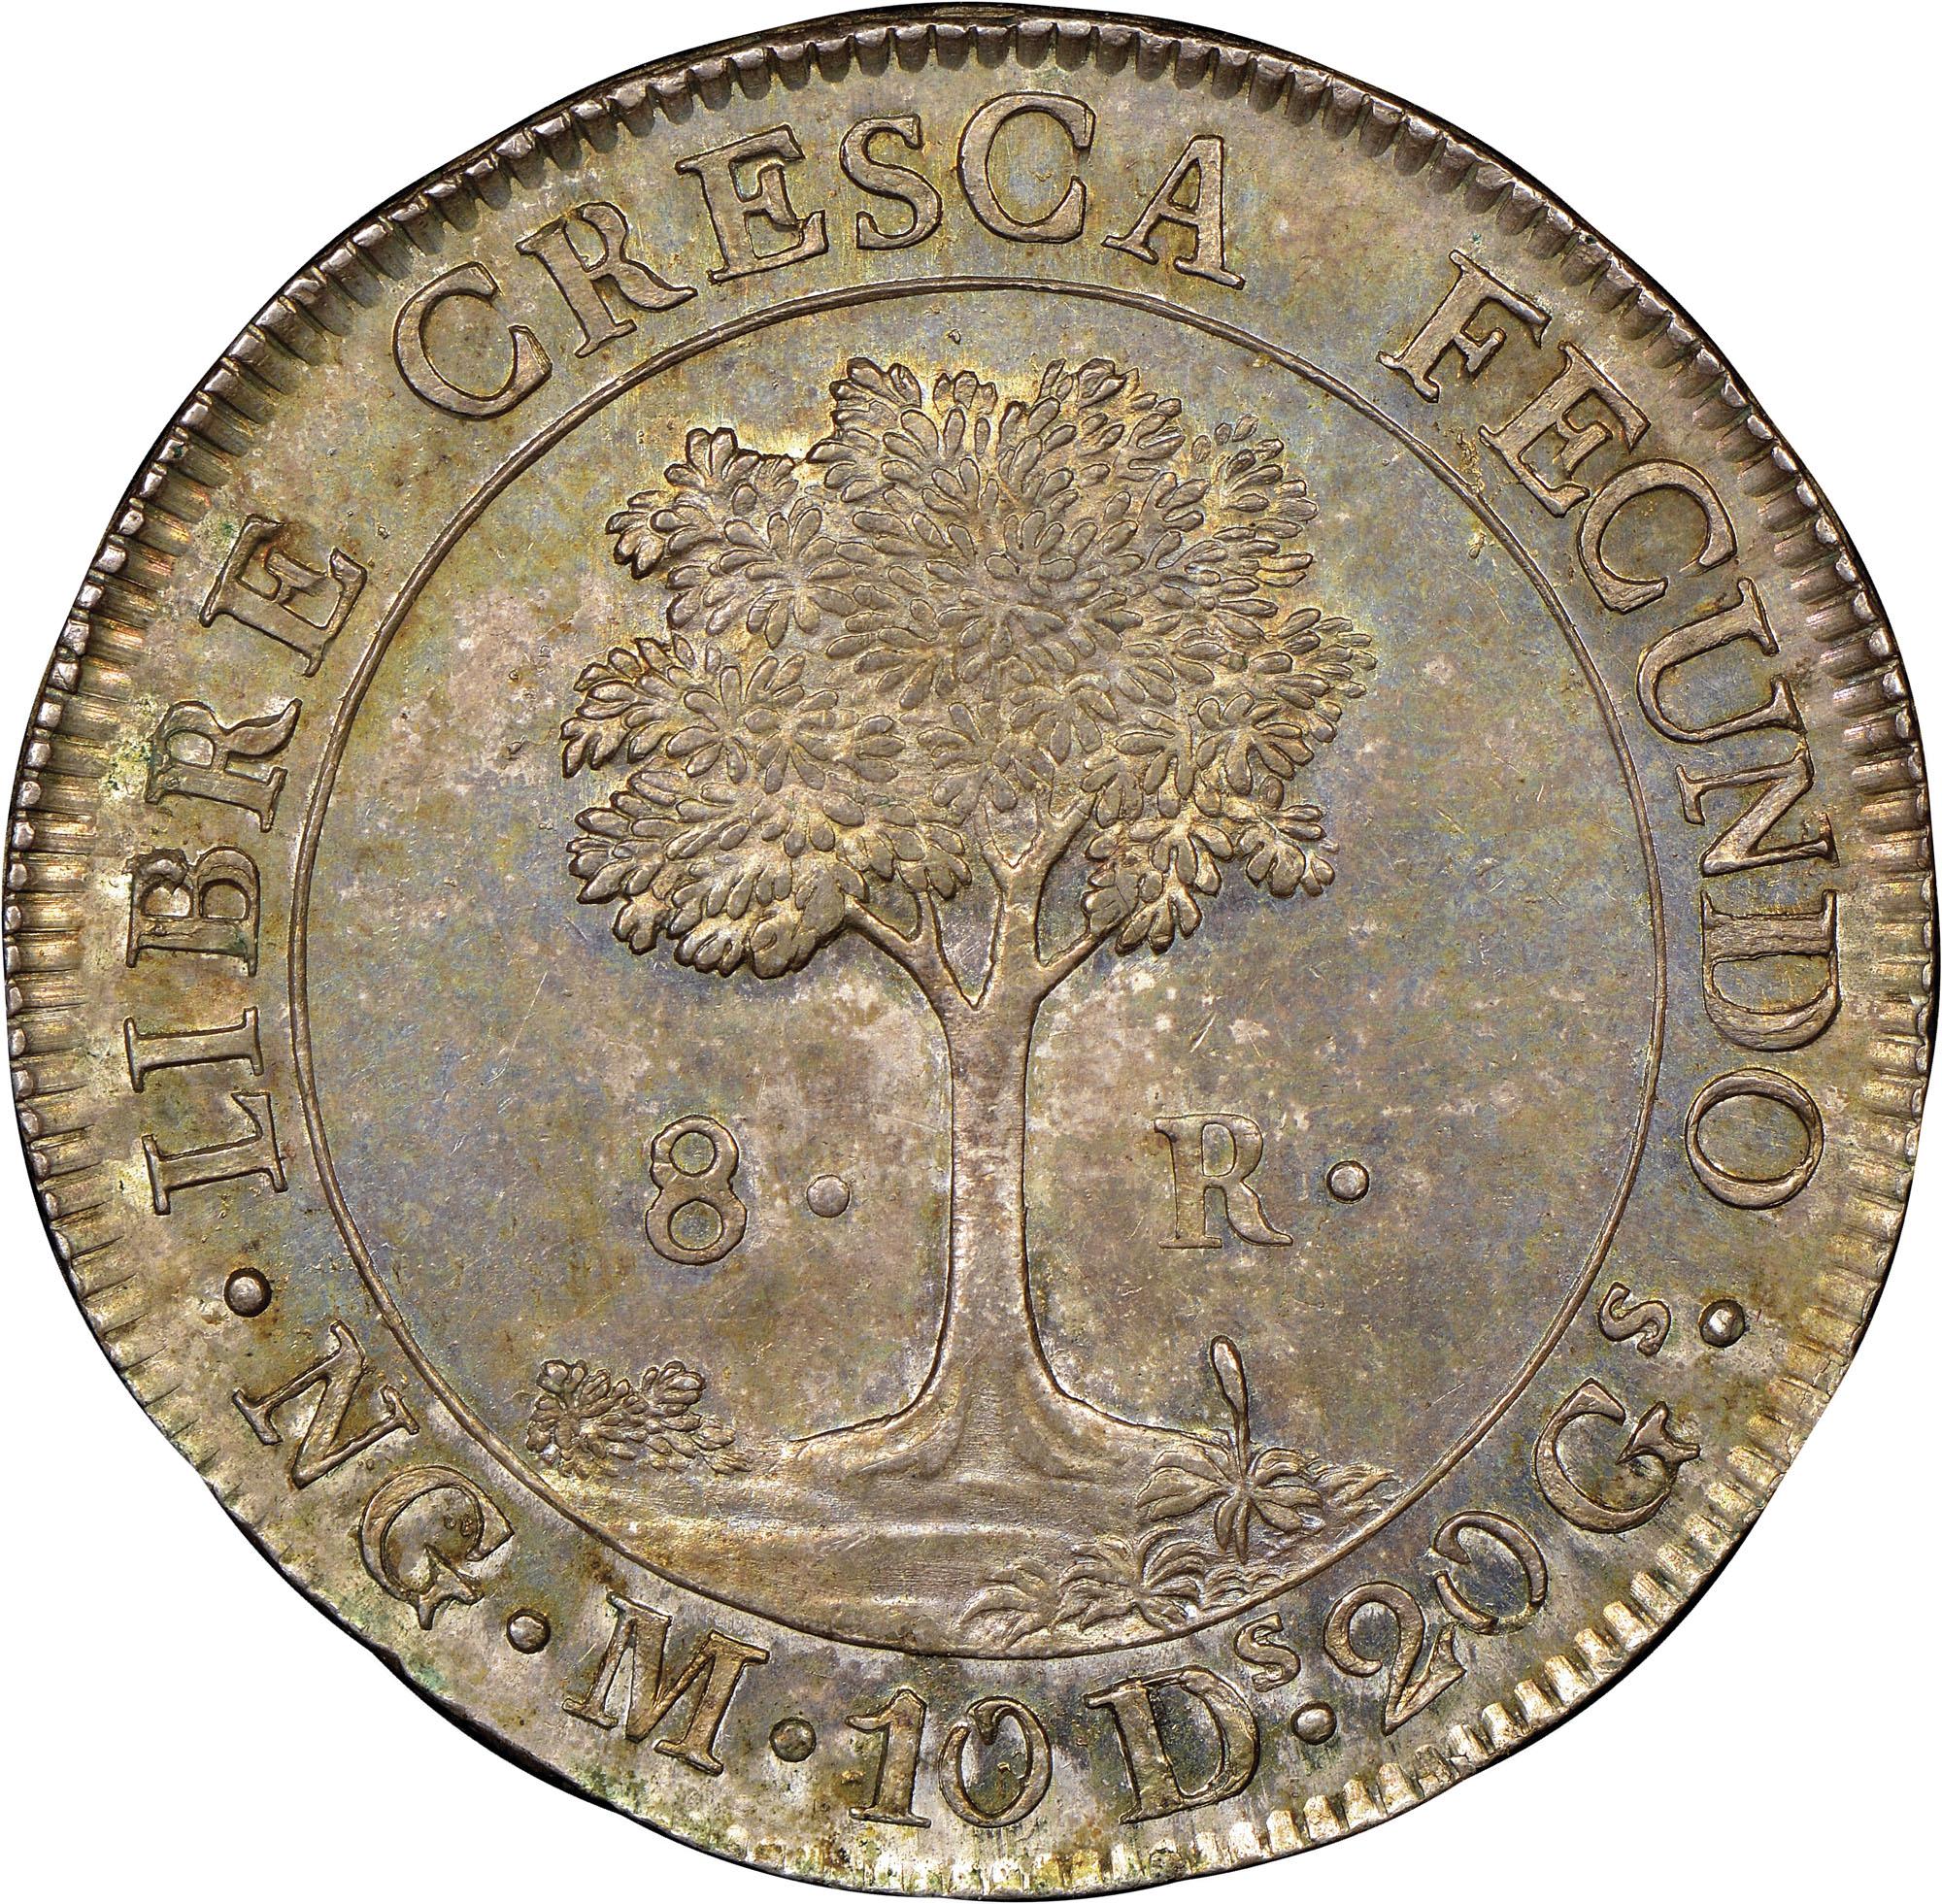 1824-1847/6 Central American Republic 8 Reales reverse